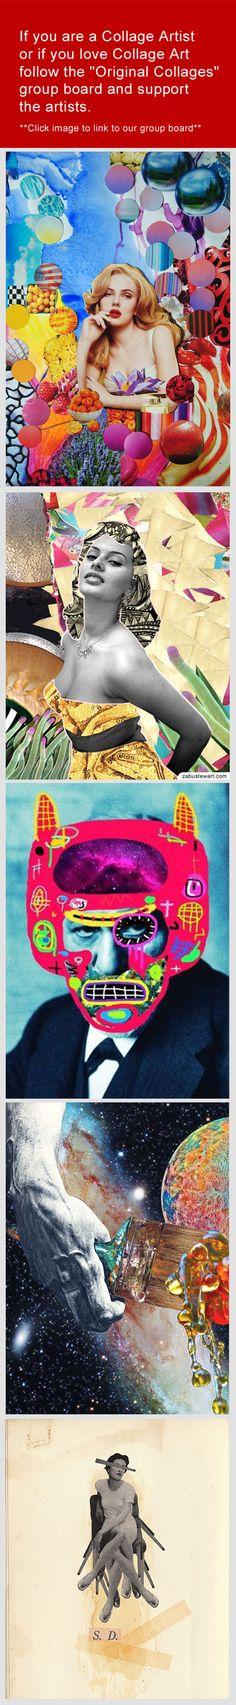 "Join or follow the  - ""Original Collages"" group board.  Prints are available for purchase.  ____________________________  Art by - John Turck, Zabu Stewart,  Andre Coronado Mendoza, Julia Lillard and Manu Duf.   ____________________________  Board URL -  http://pinterest.com/zabustewart/original-collages/"